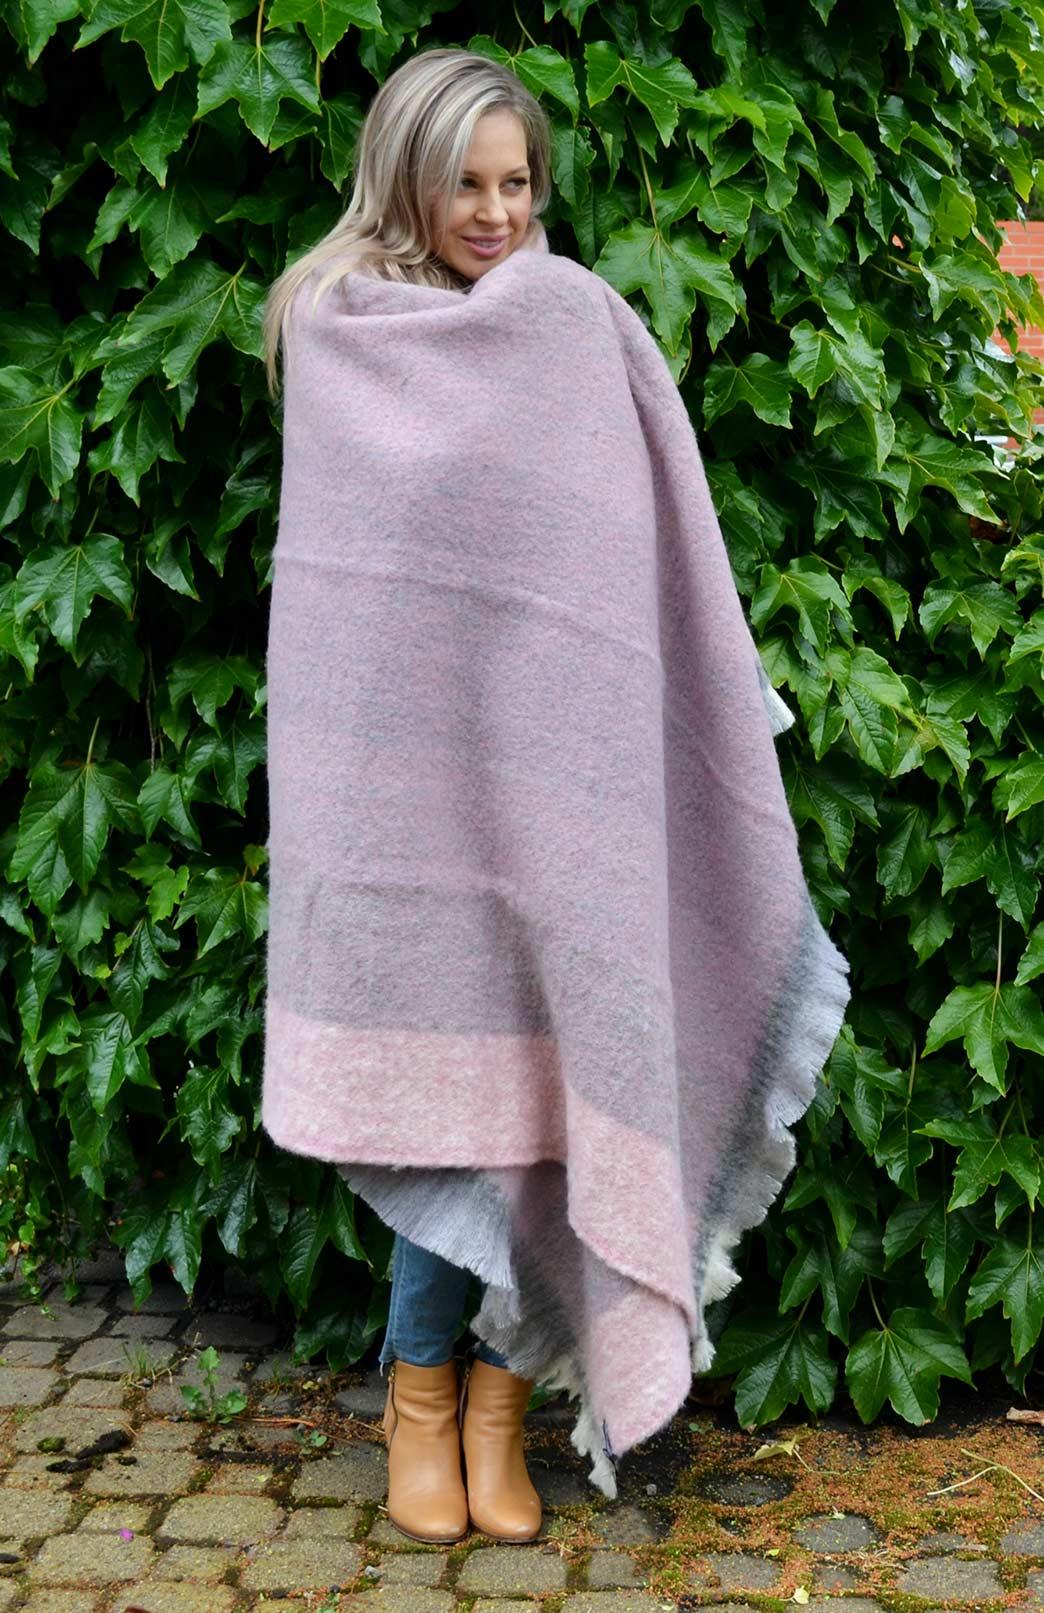 Alpaca Wool Throw Rug - Pure Alpaca Wool Throw Rug Winter Blanket - Smitten Merino Tasmania Australia